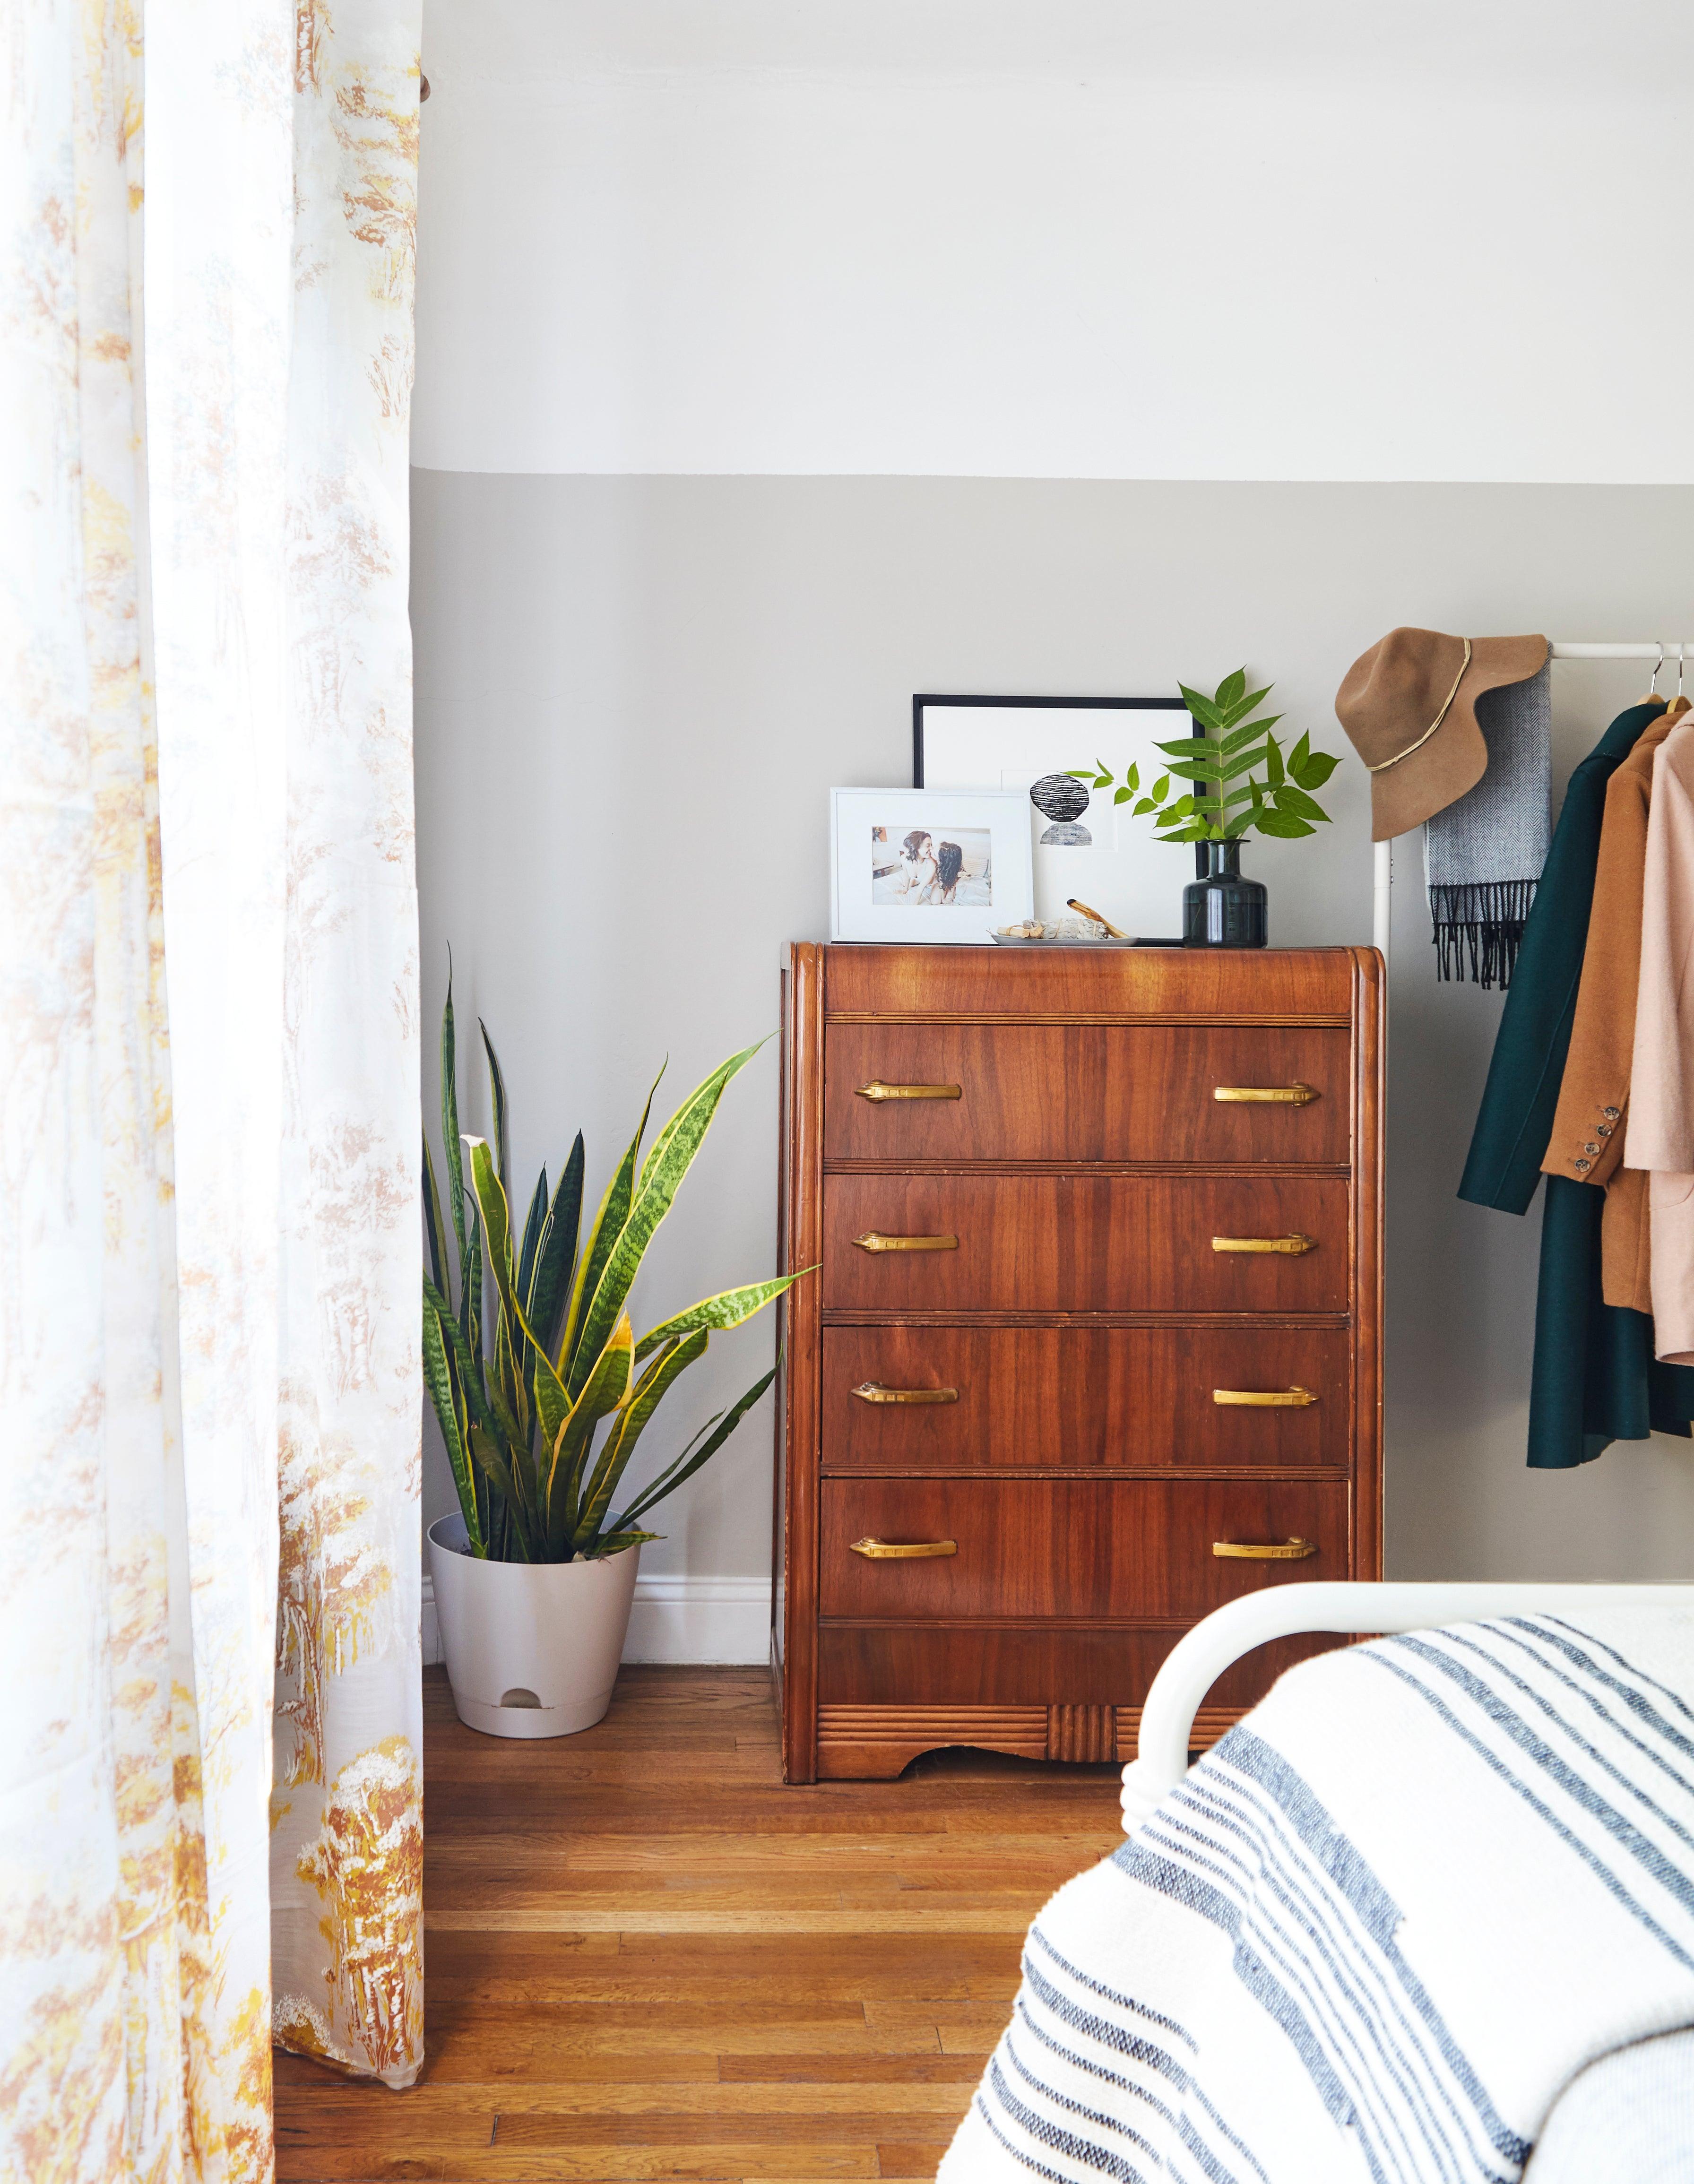 Design by Velinda Hellen_DIY_Photo by Veronica Crawford_3